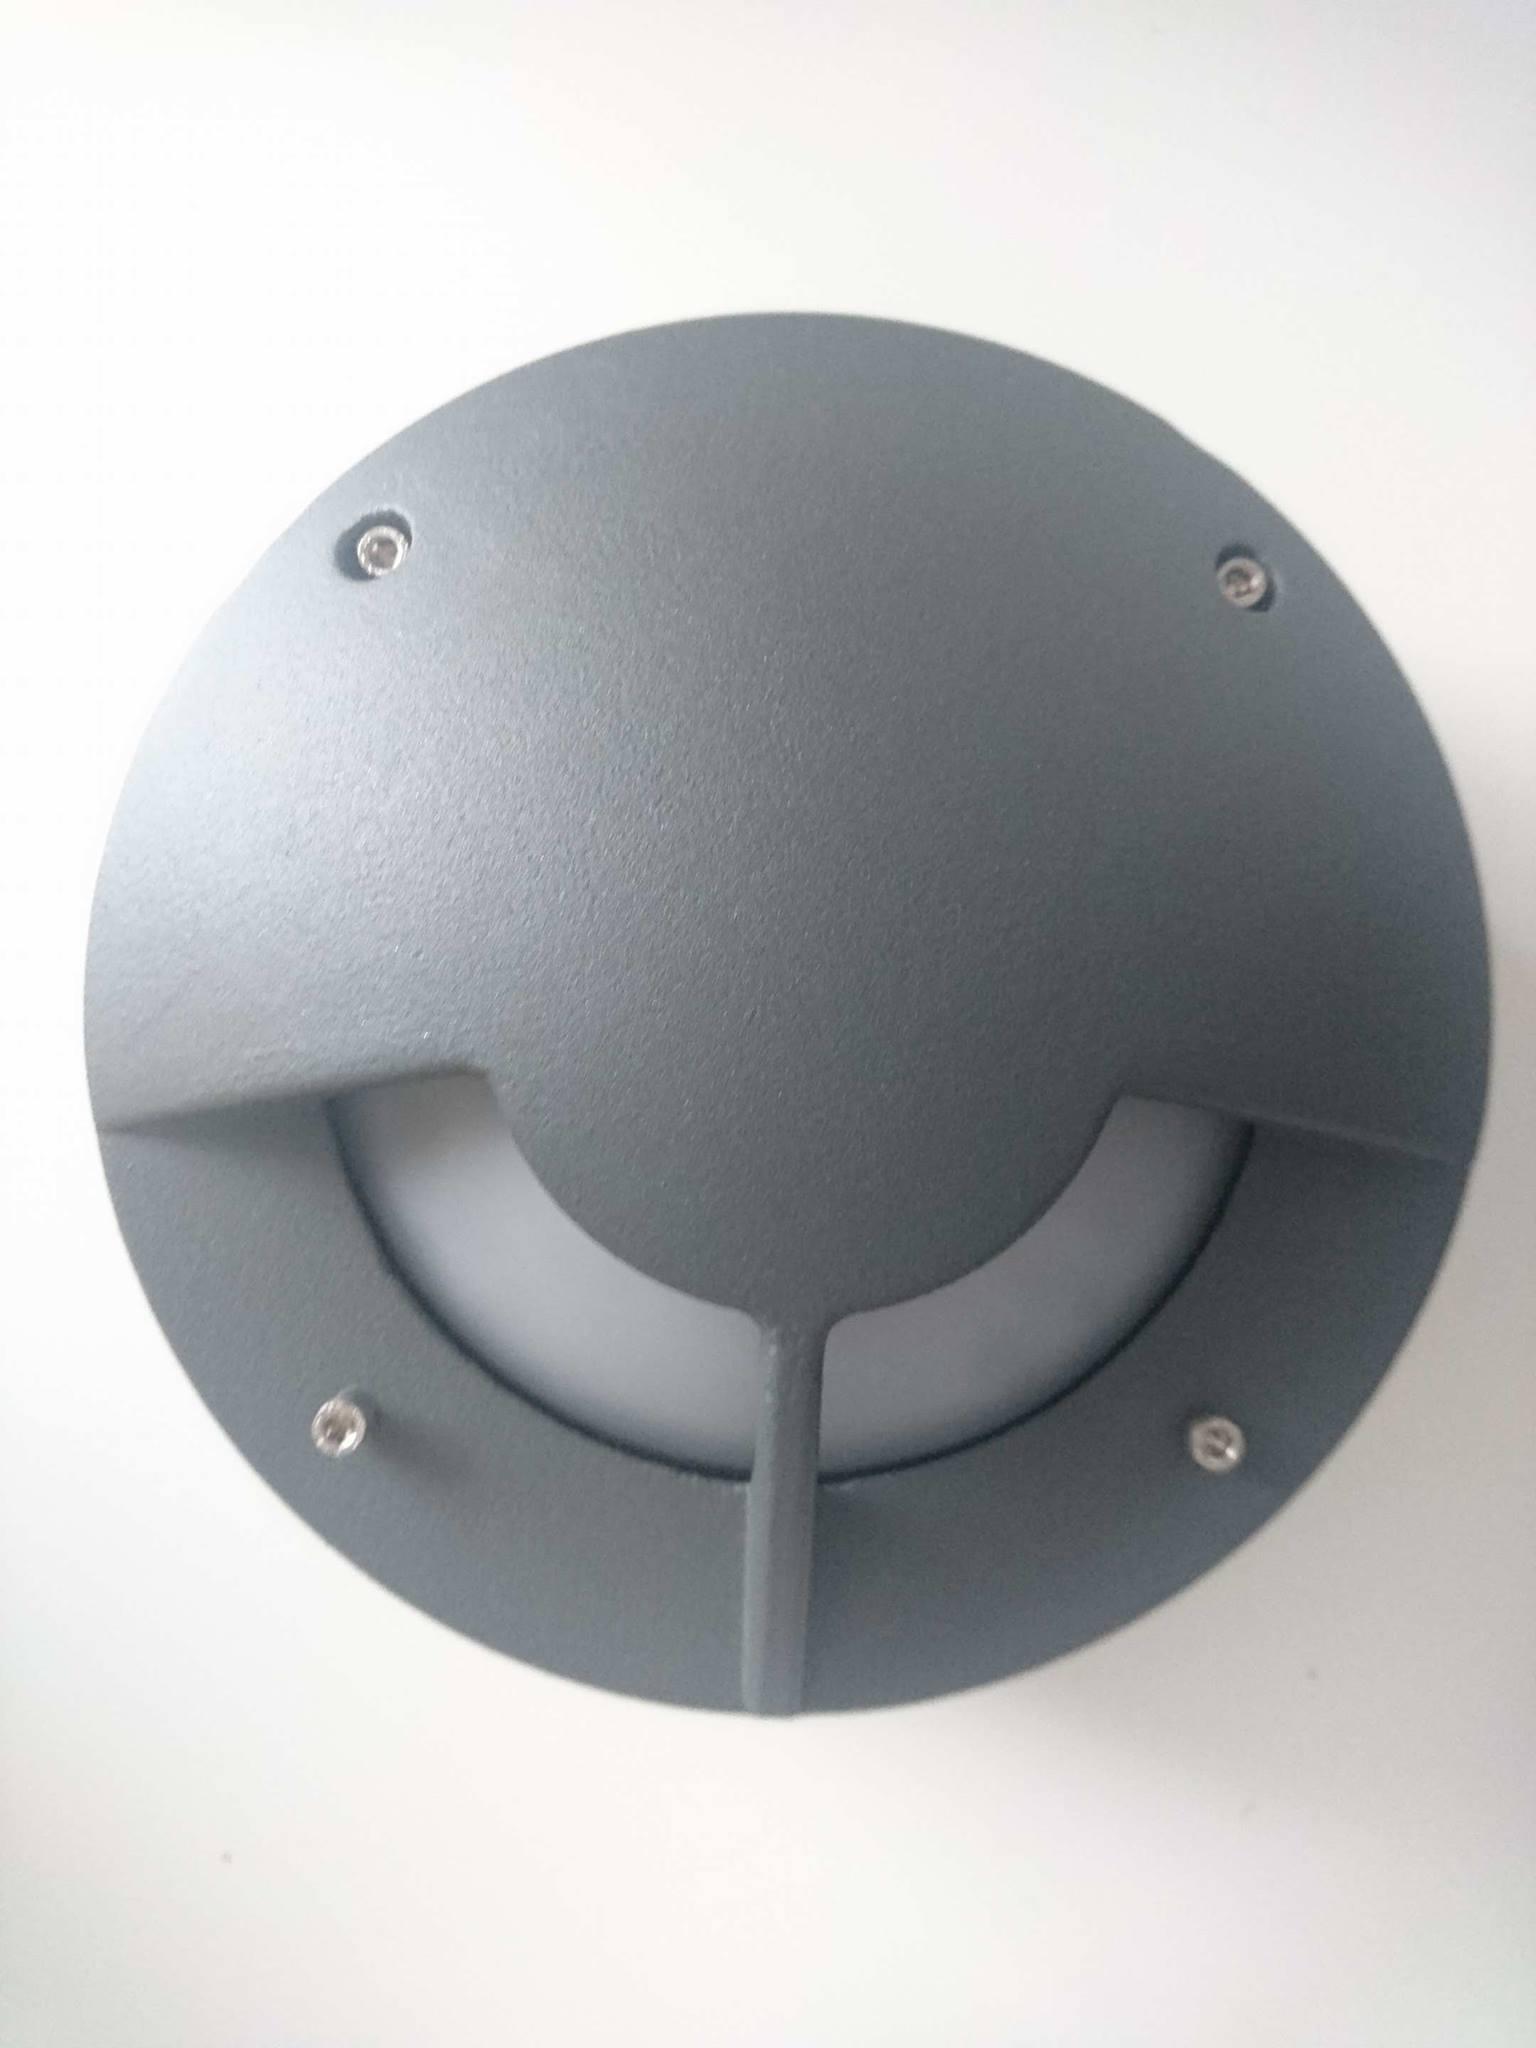 ARES overhead lamp TIPO CLIO TEB 2002